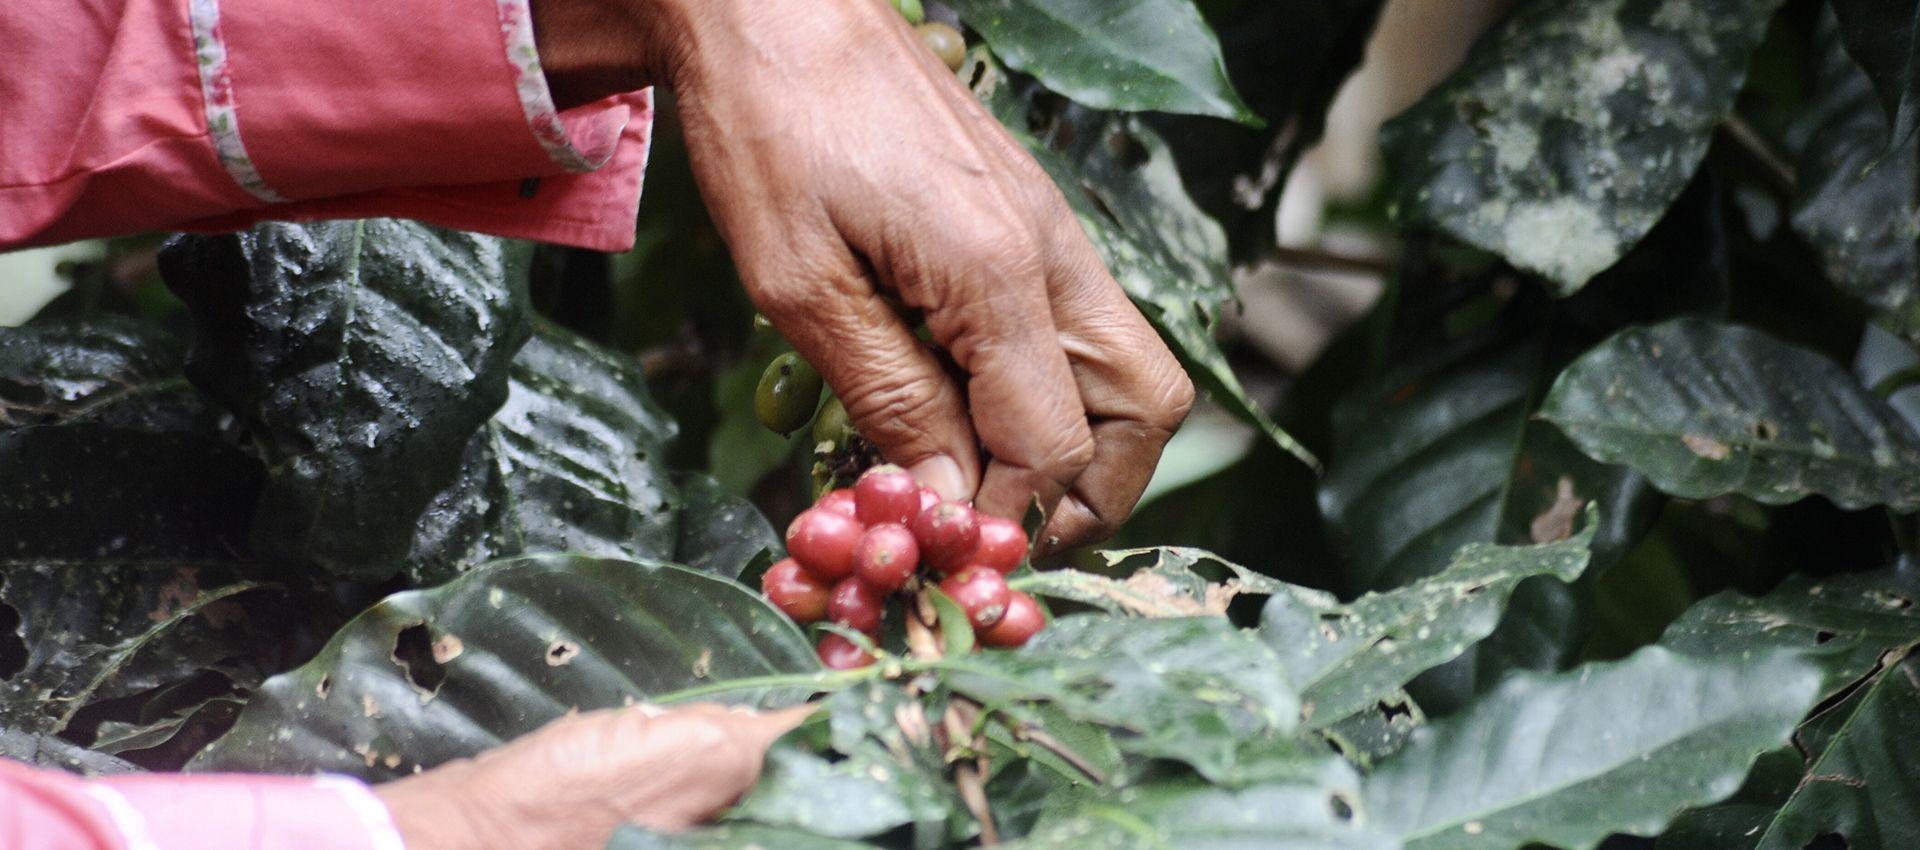 Caffè Vergnano supports Women coffee producers